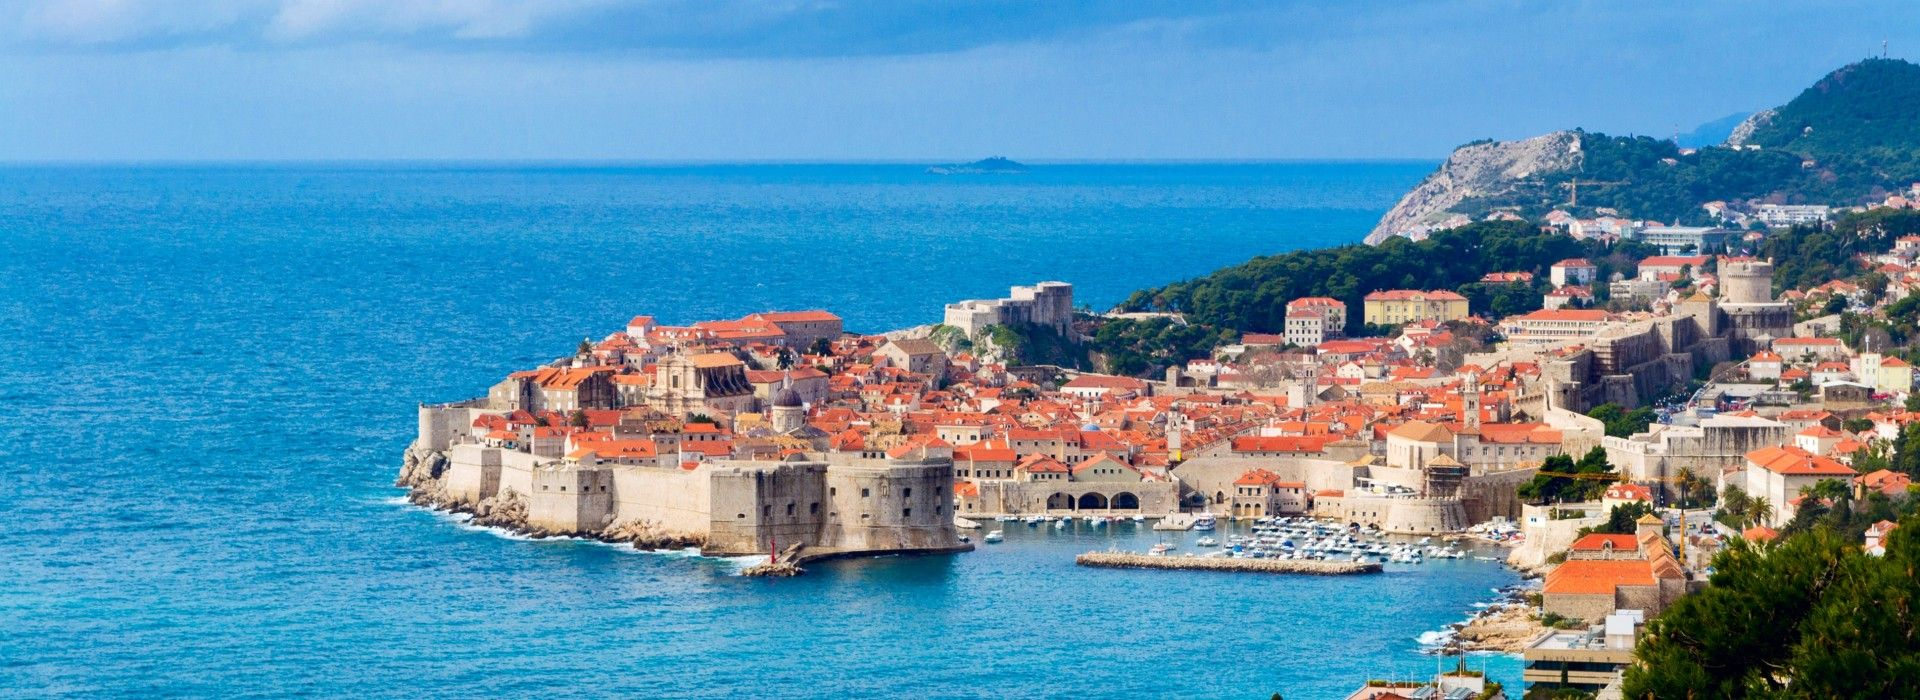 Natural landmarks sightseeing Tours in Croatia